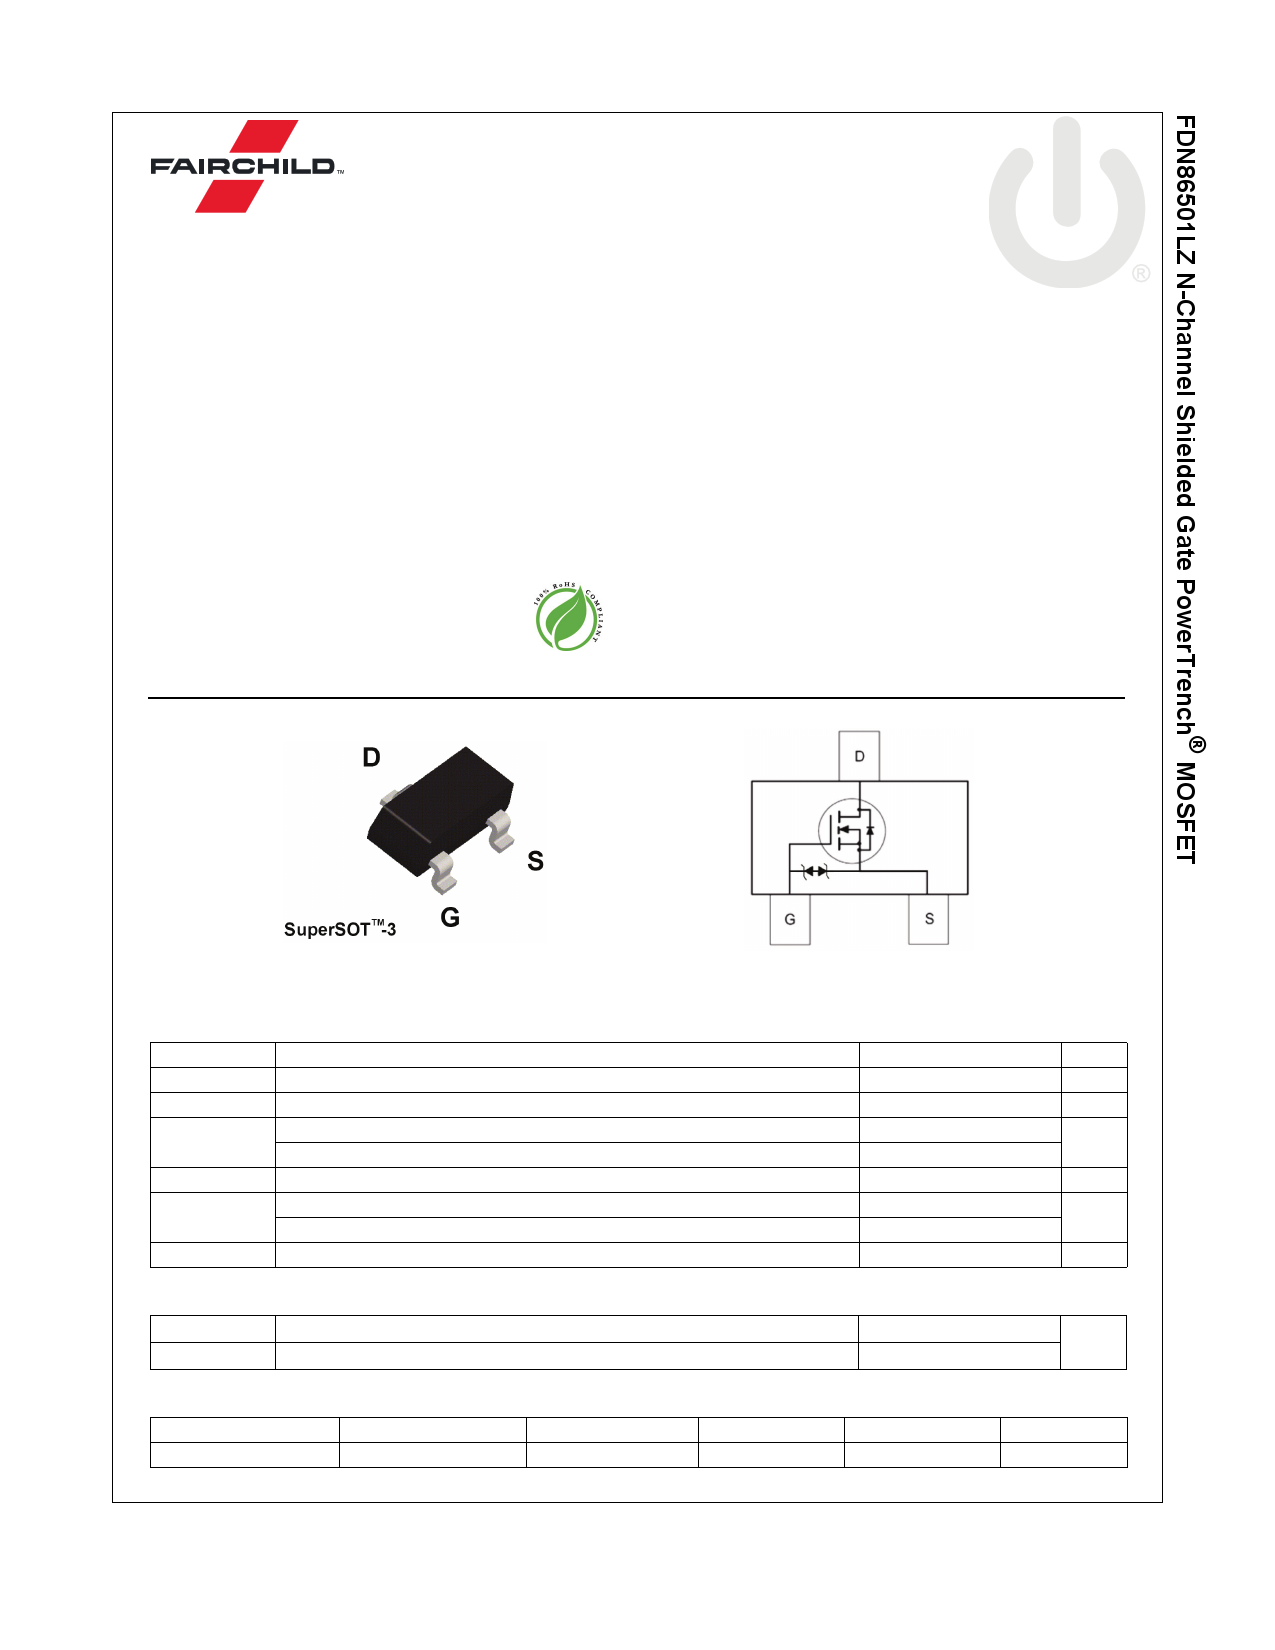 FDN86501LZ 데이터시트 및 FDN86501LZ PDF